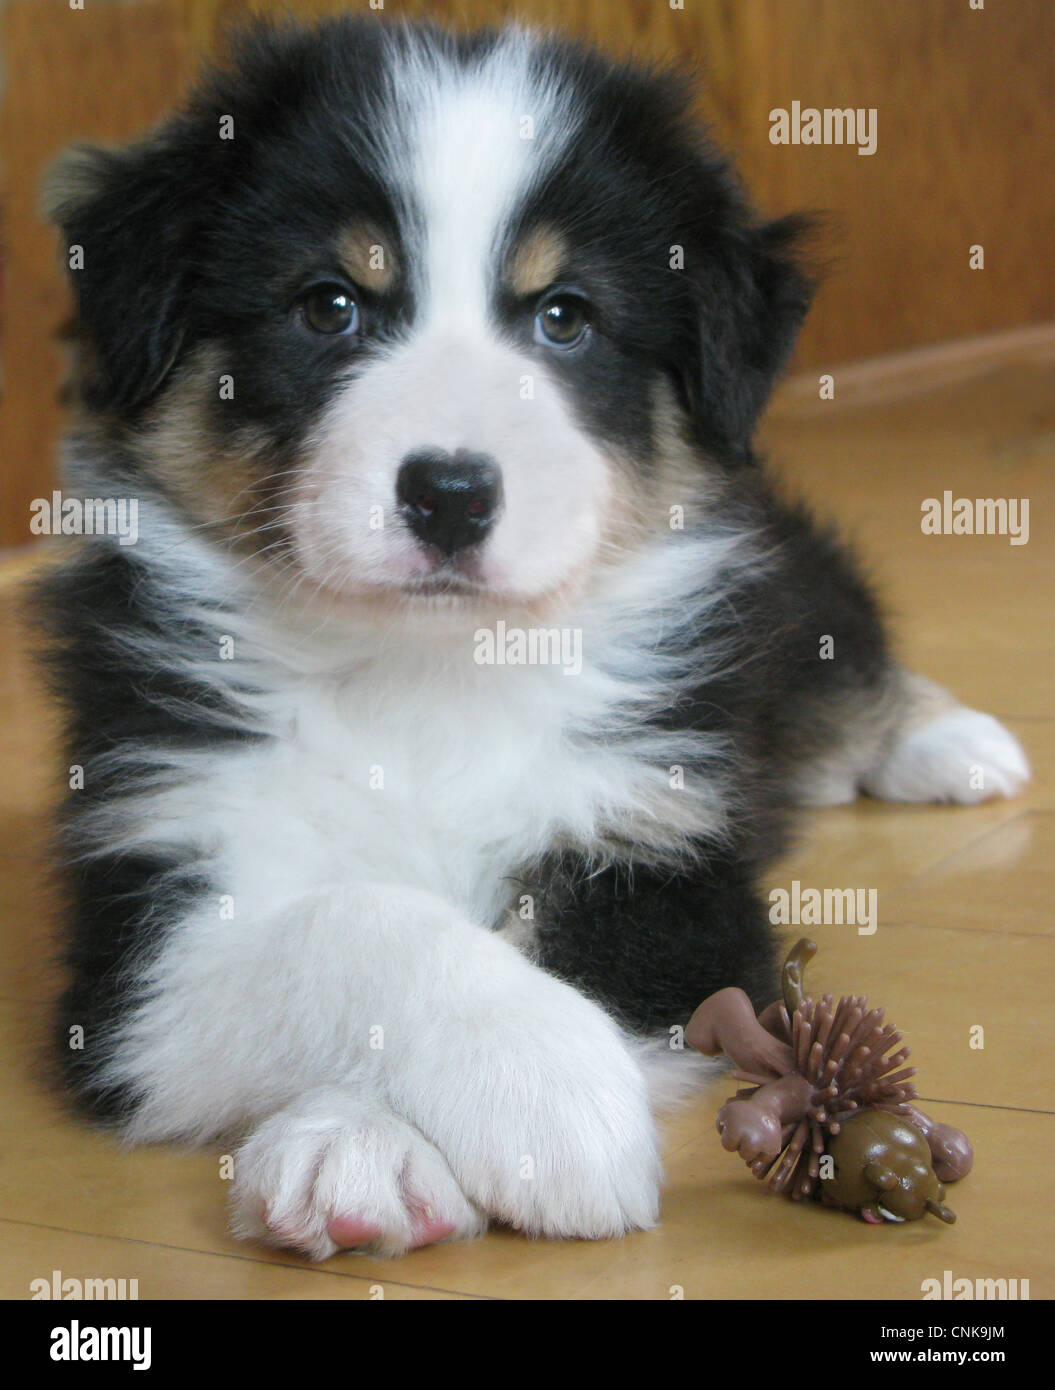 Portrait of Australian shepherd puppy crossing his paws. - Stock Image